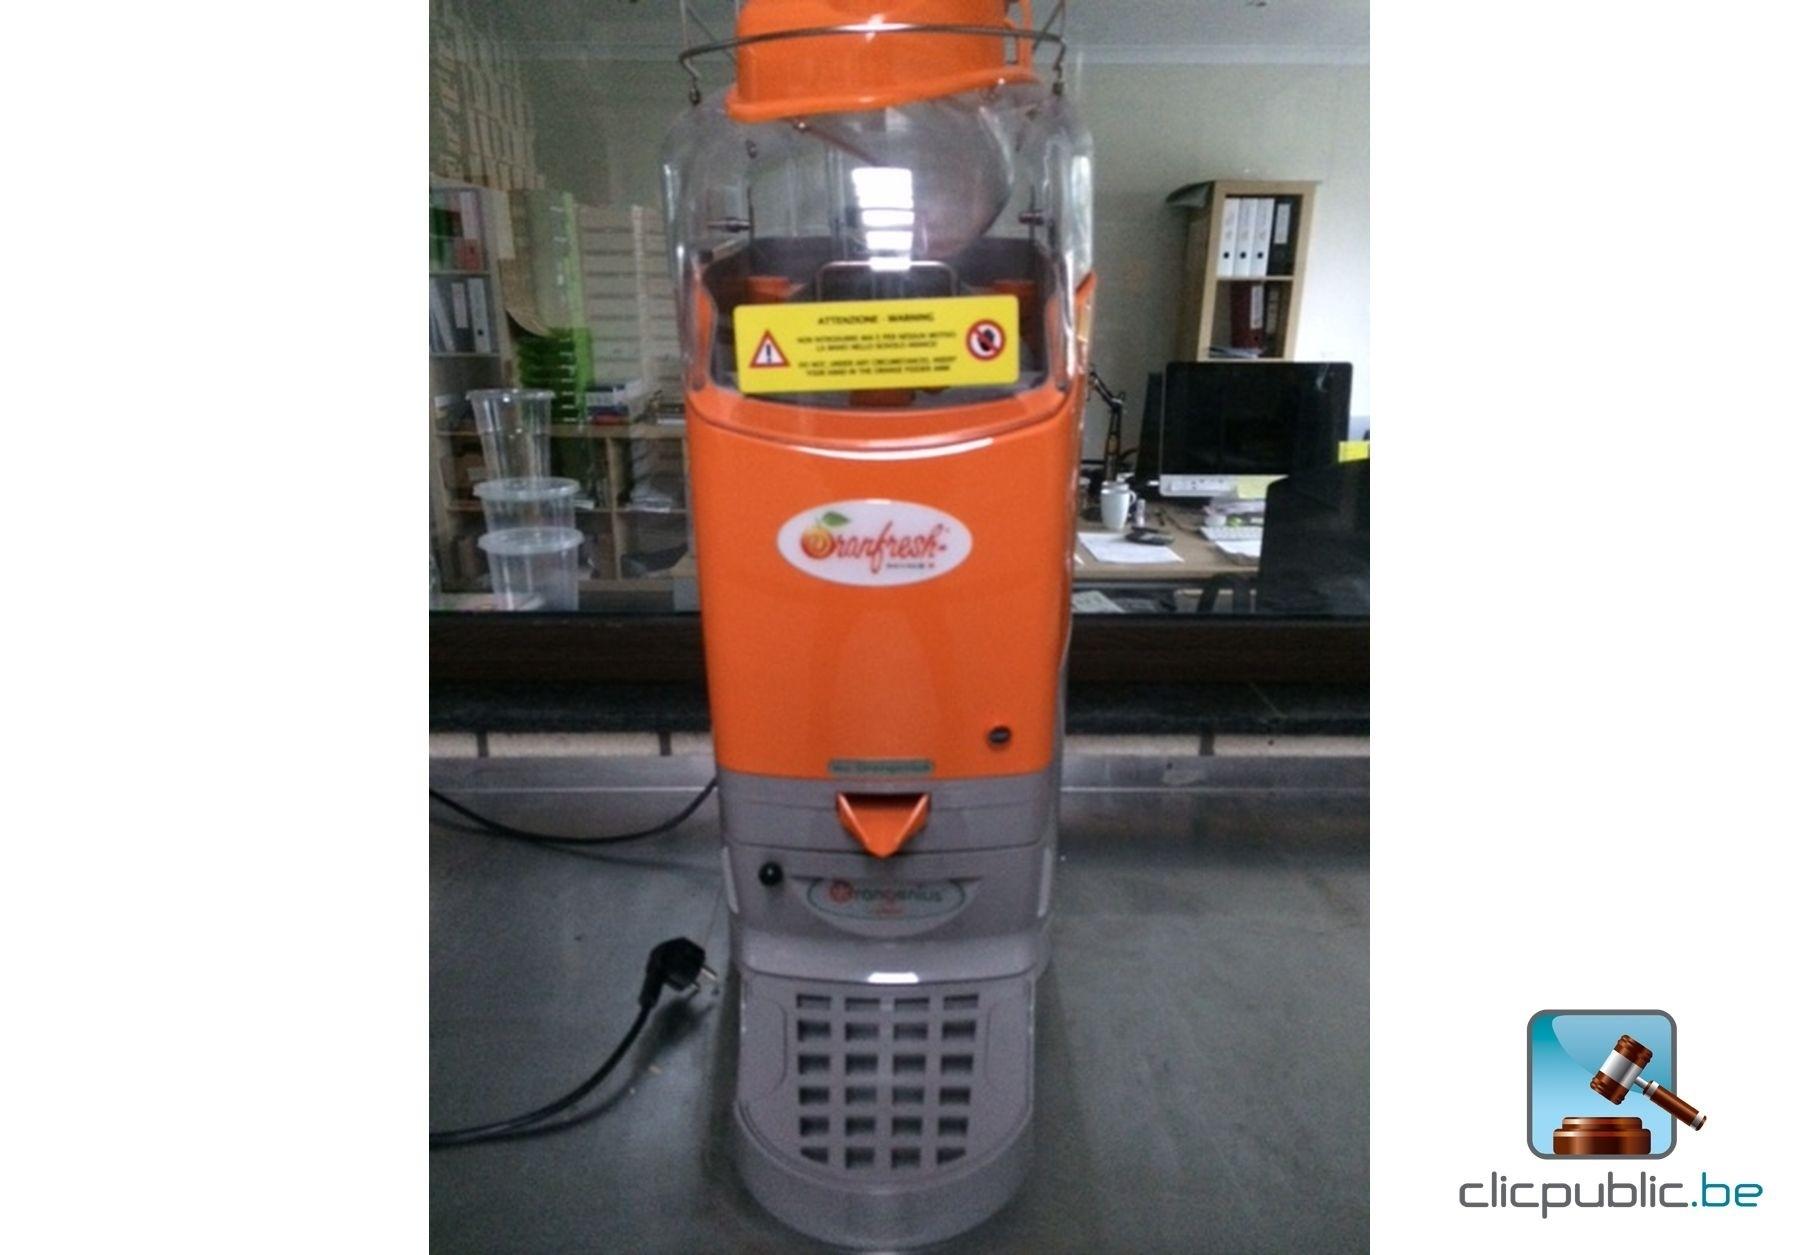 Presse agrumes professionnel oranfresh orangenius vendre sur for Presse agrume professionnel